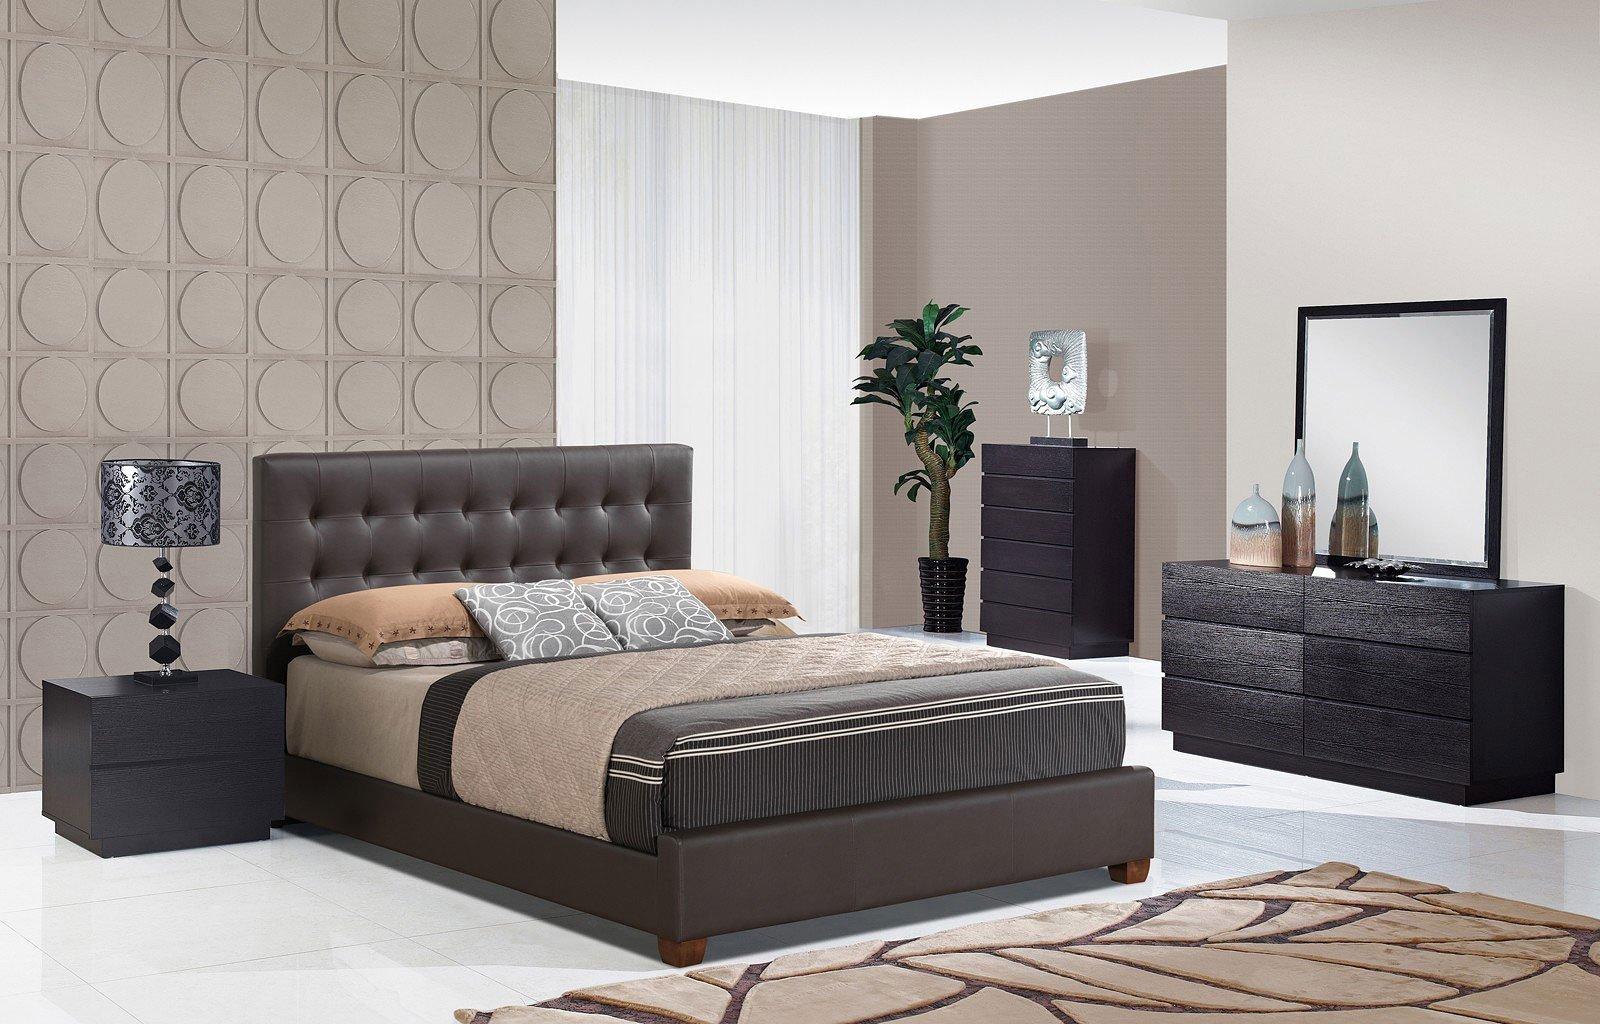 Metro bedroom set w 8101 upholstered bed by global furniture furniturepick for Standard furniture metro bedroom collection